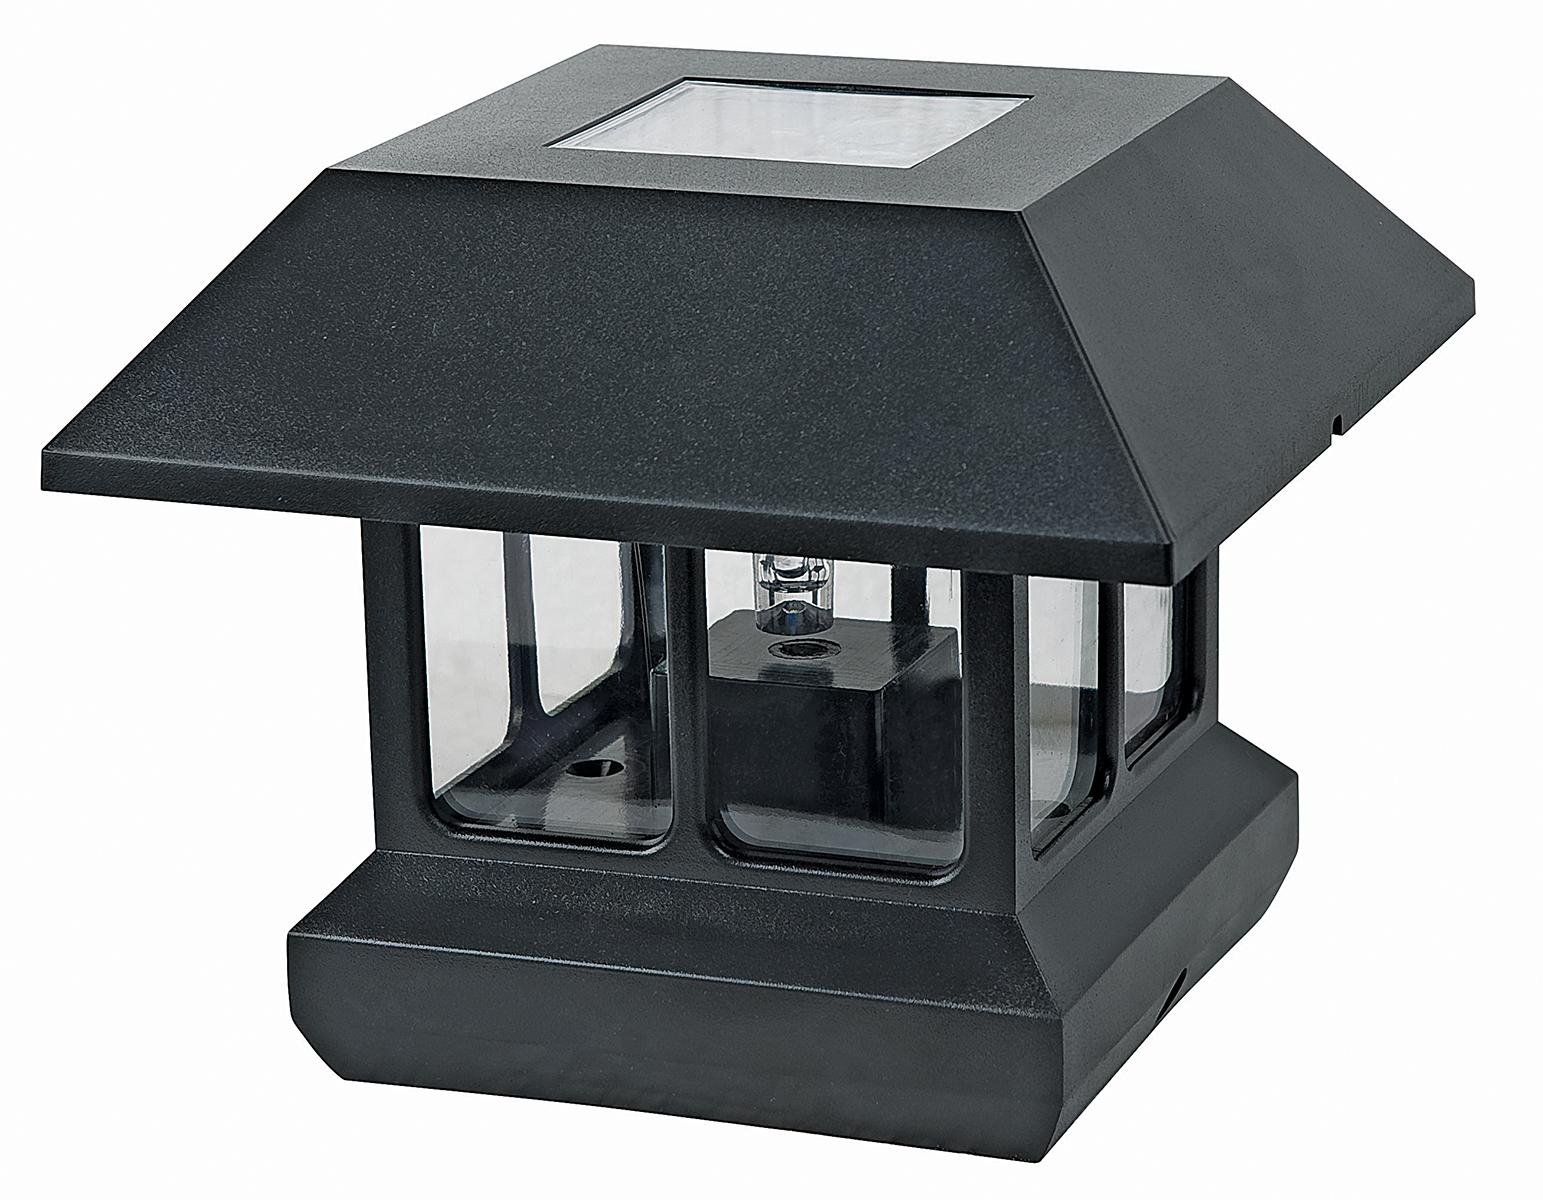 Paradise Solar Outdoor Garden 2 In 1 LED Post Cap Pathway Light Black EBay